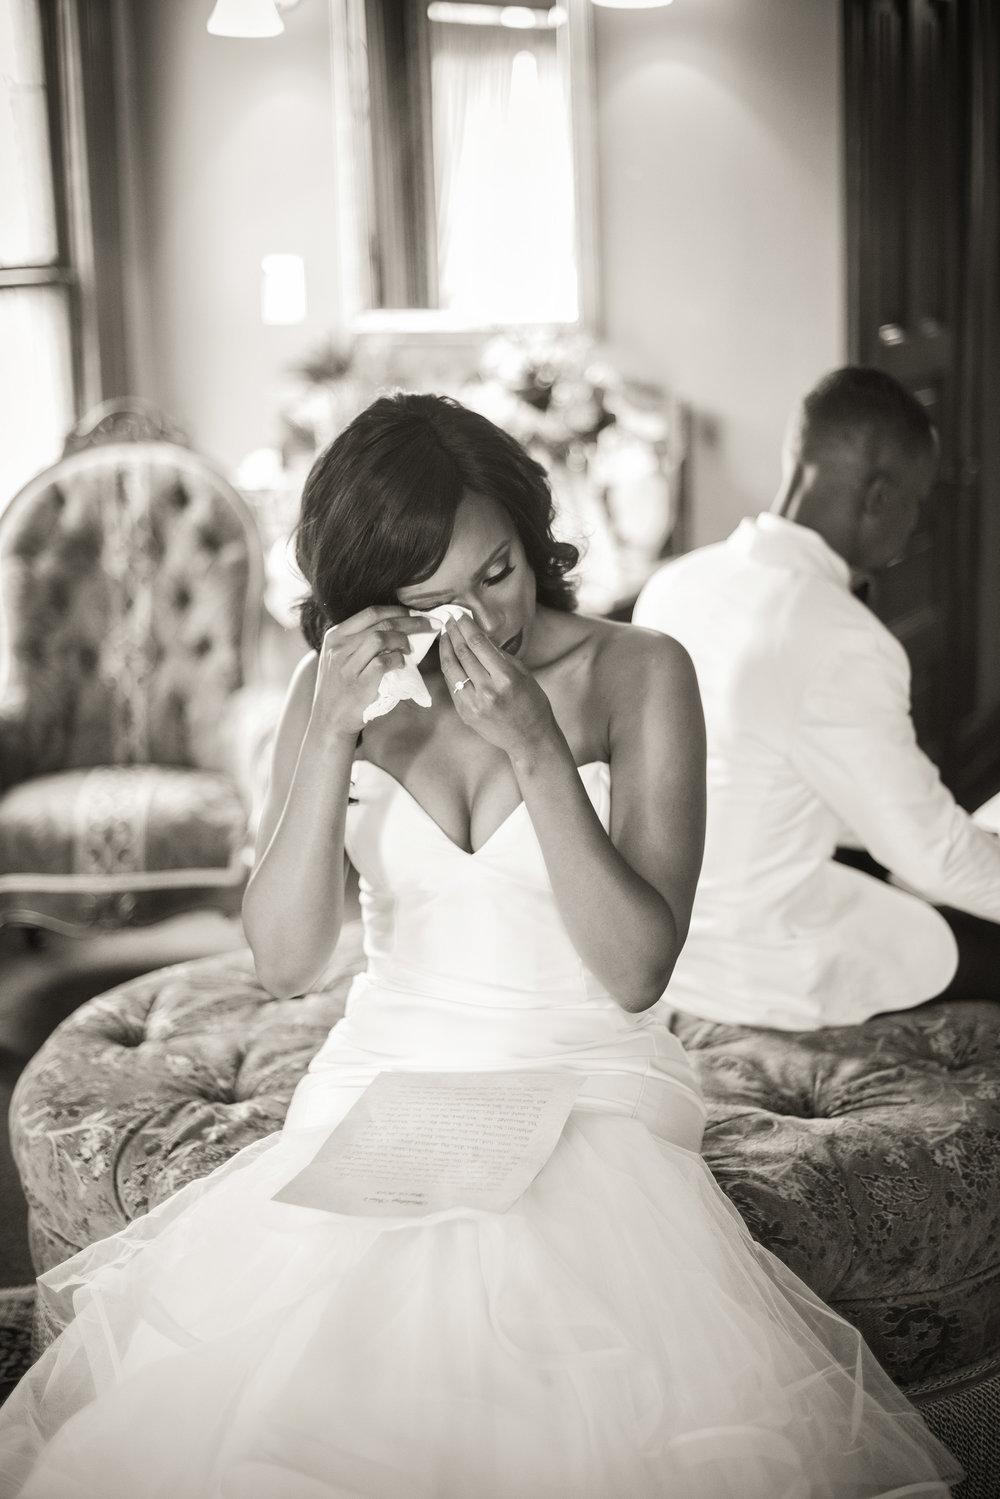 glamorous-jewel-tones-christmas-house-wedding-carrie-vines-008.jpg